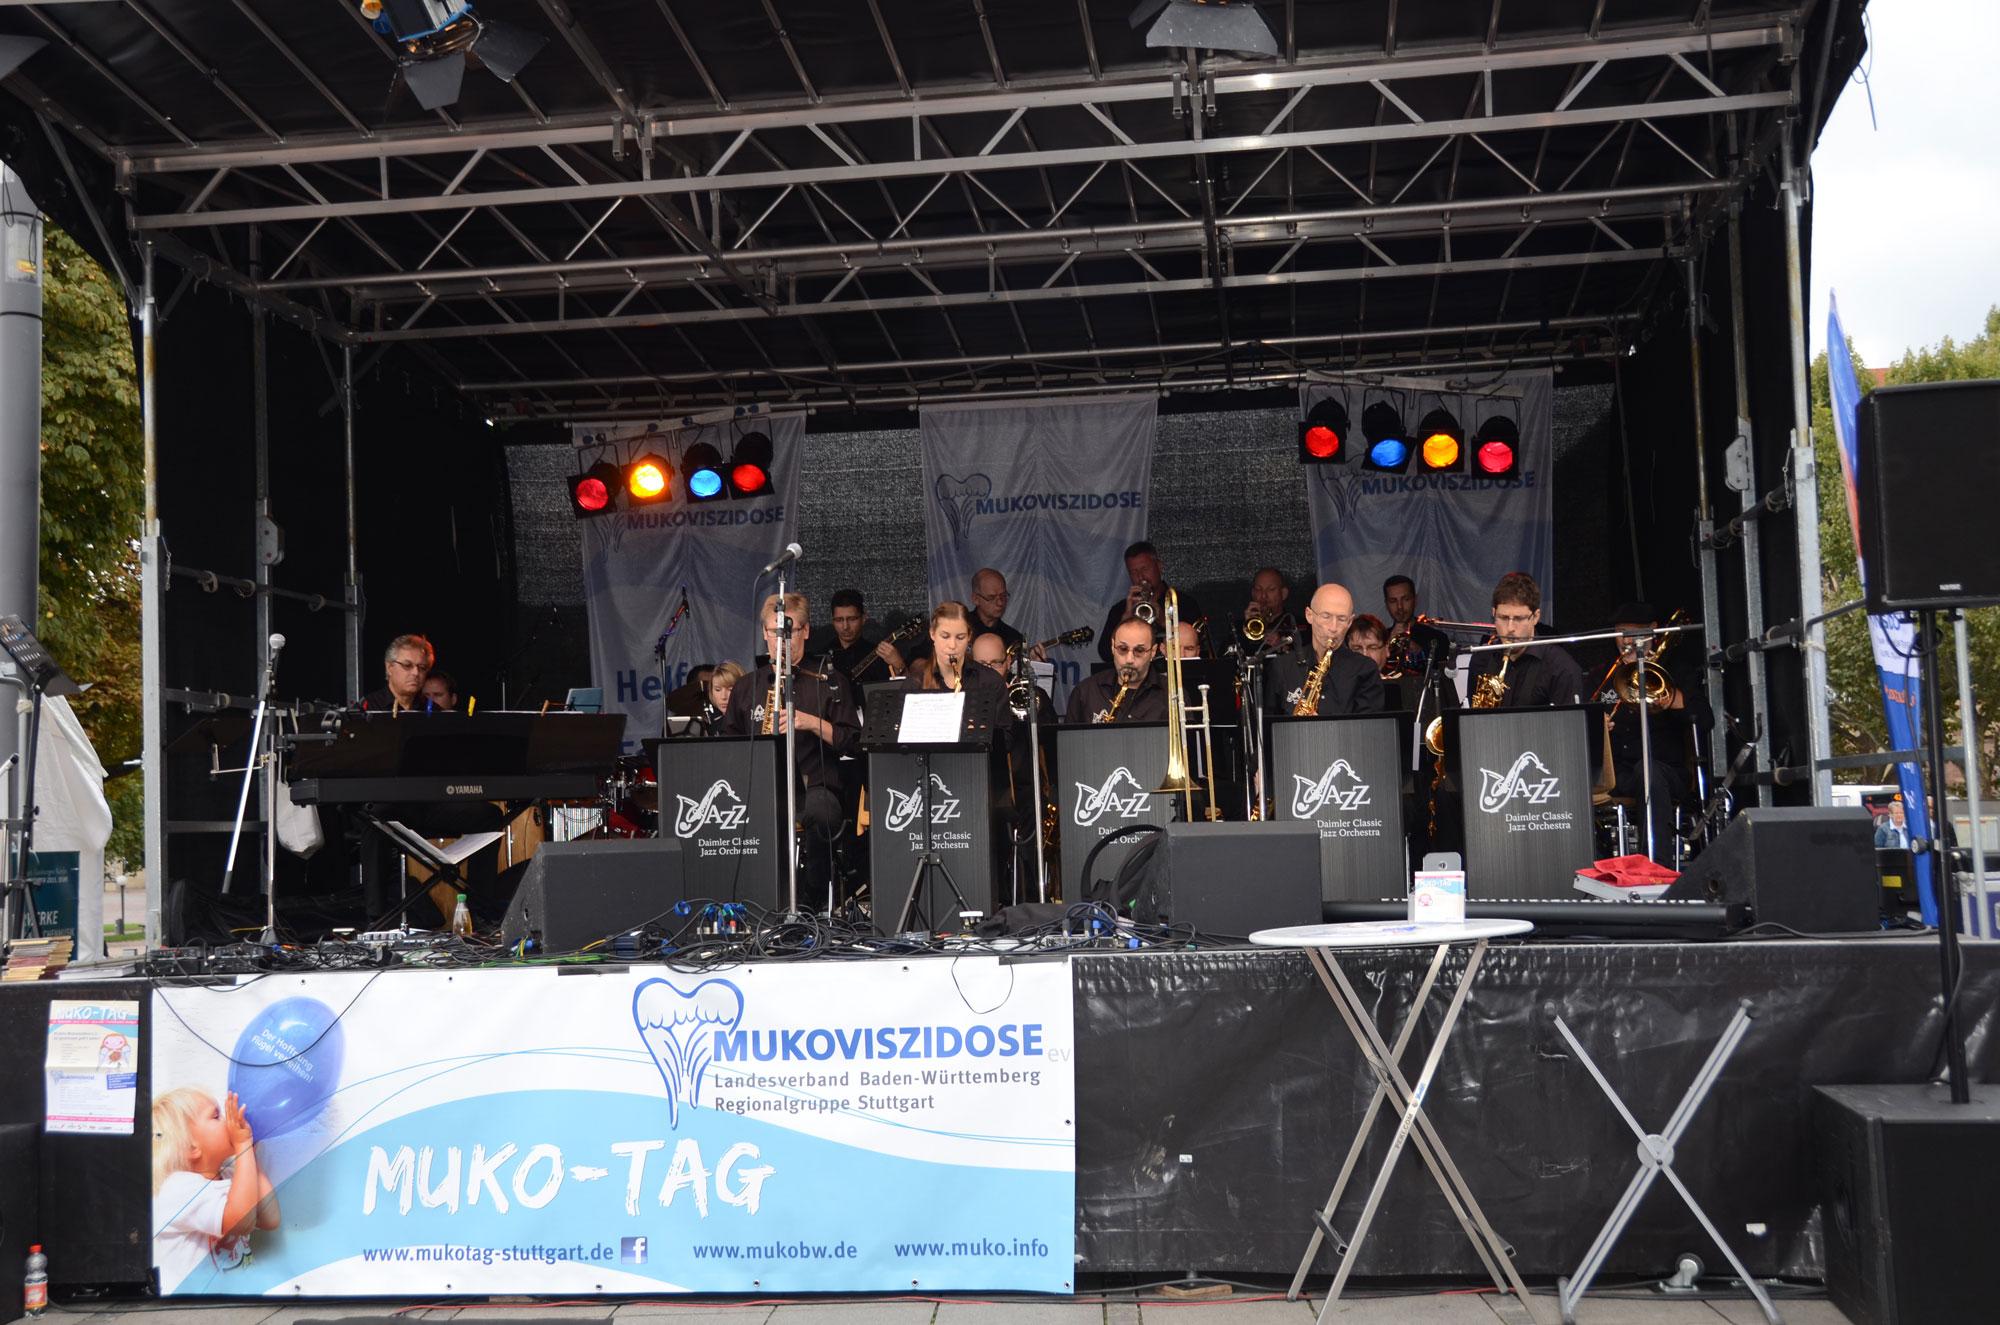 Muko-Tag Stuttgart